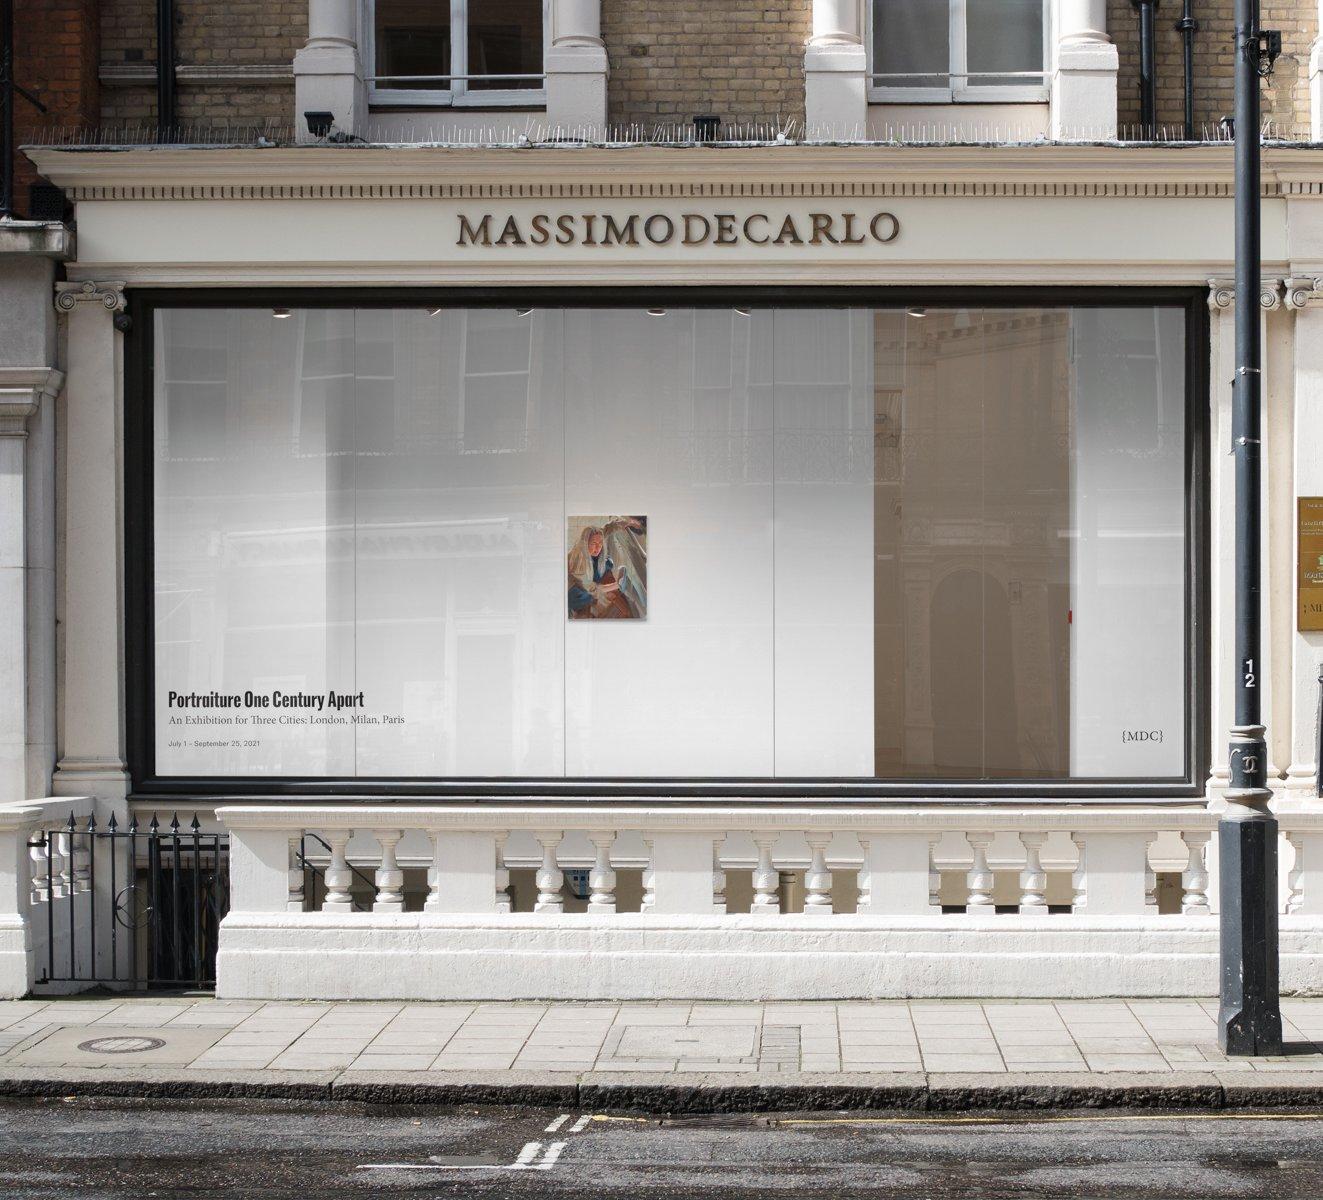 Massimo de Carlo London Portraiture One Century Apart 11